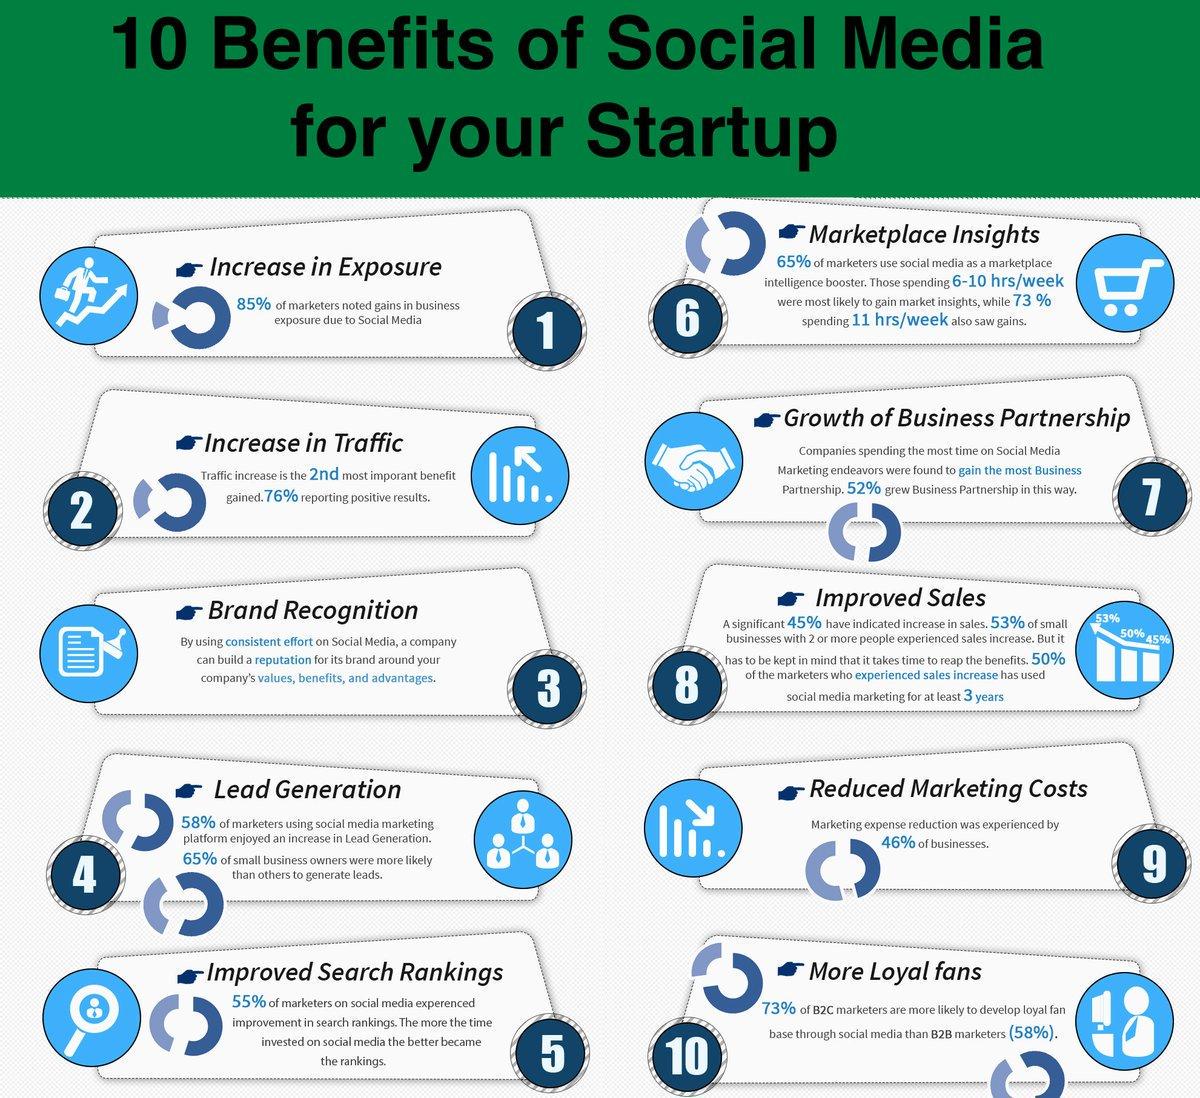 10 Benefits of #SocialMedia for Your #Startup Success [Infographic] #SMM #SocialMediaMarketing #LeadGeneration #Sales #SEO #Branding<br>http://pic.twitter.com/7NnDCRG63x